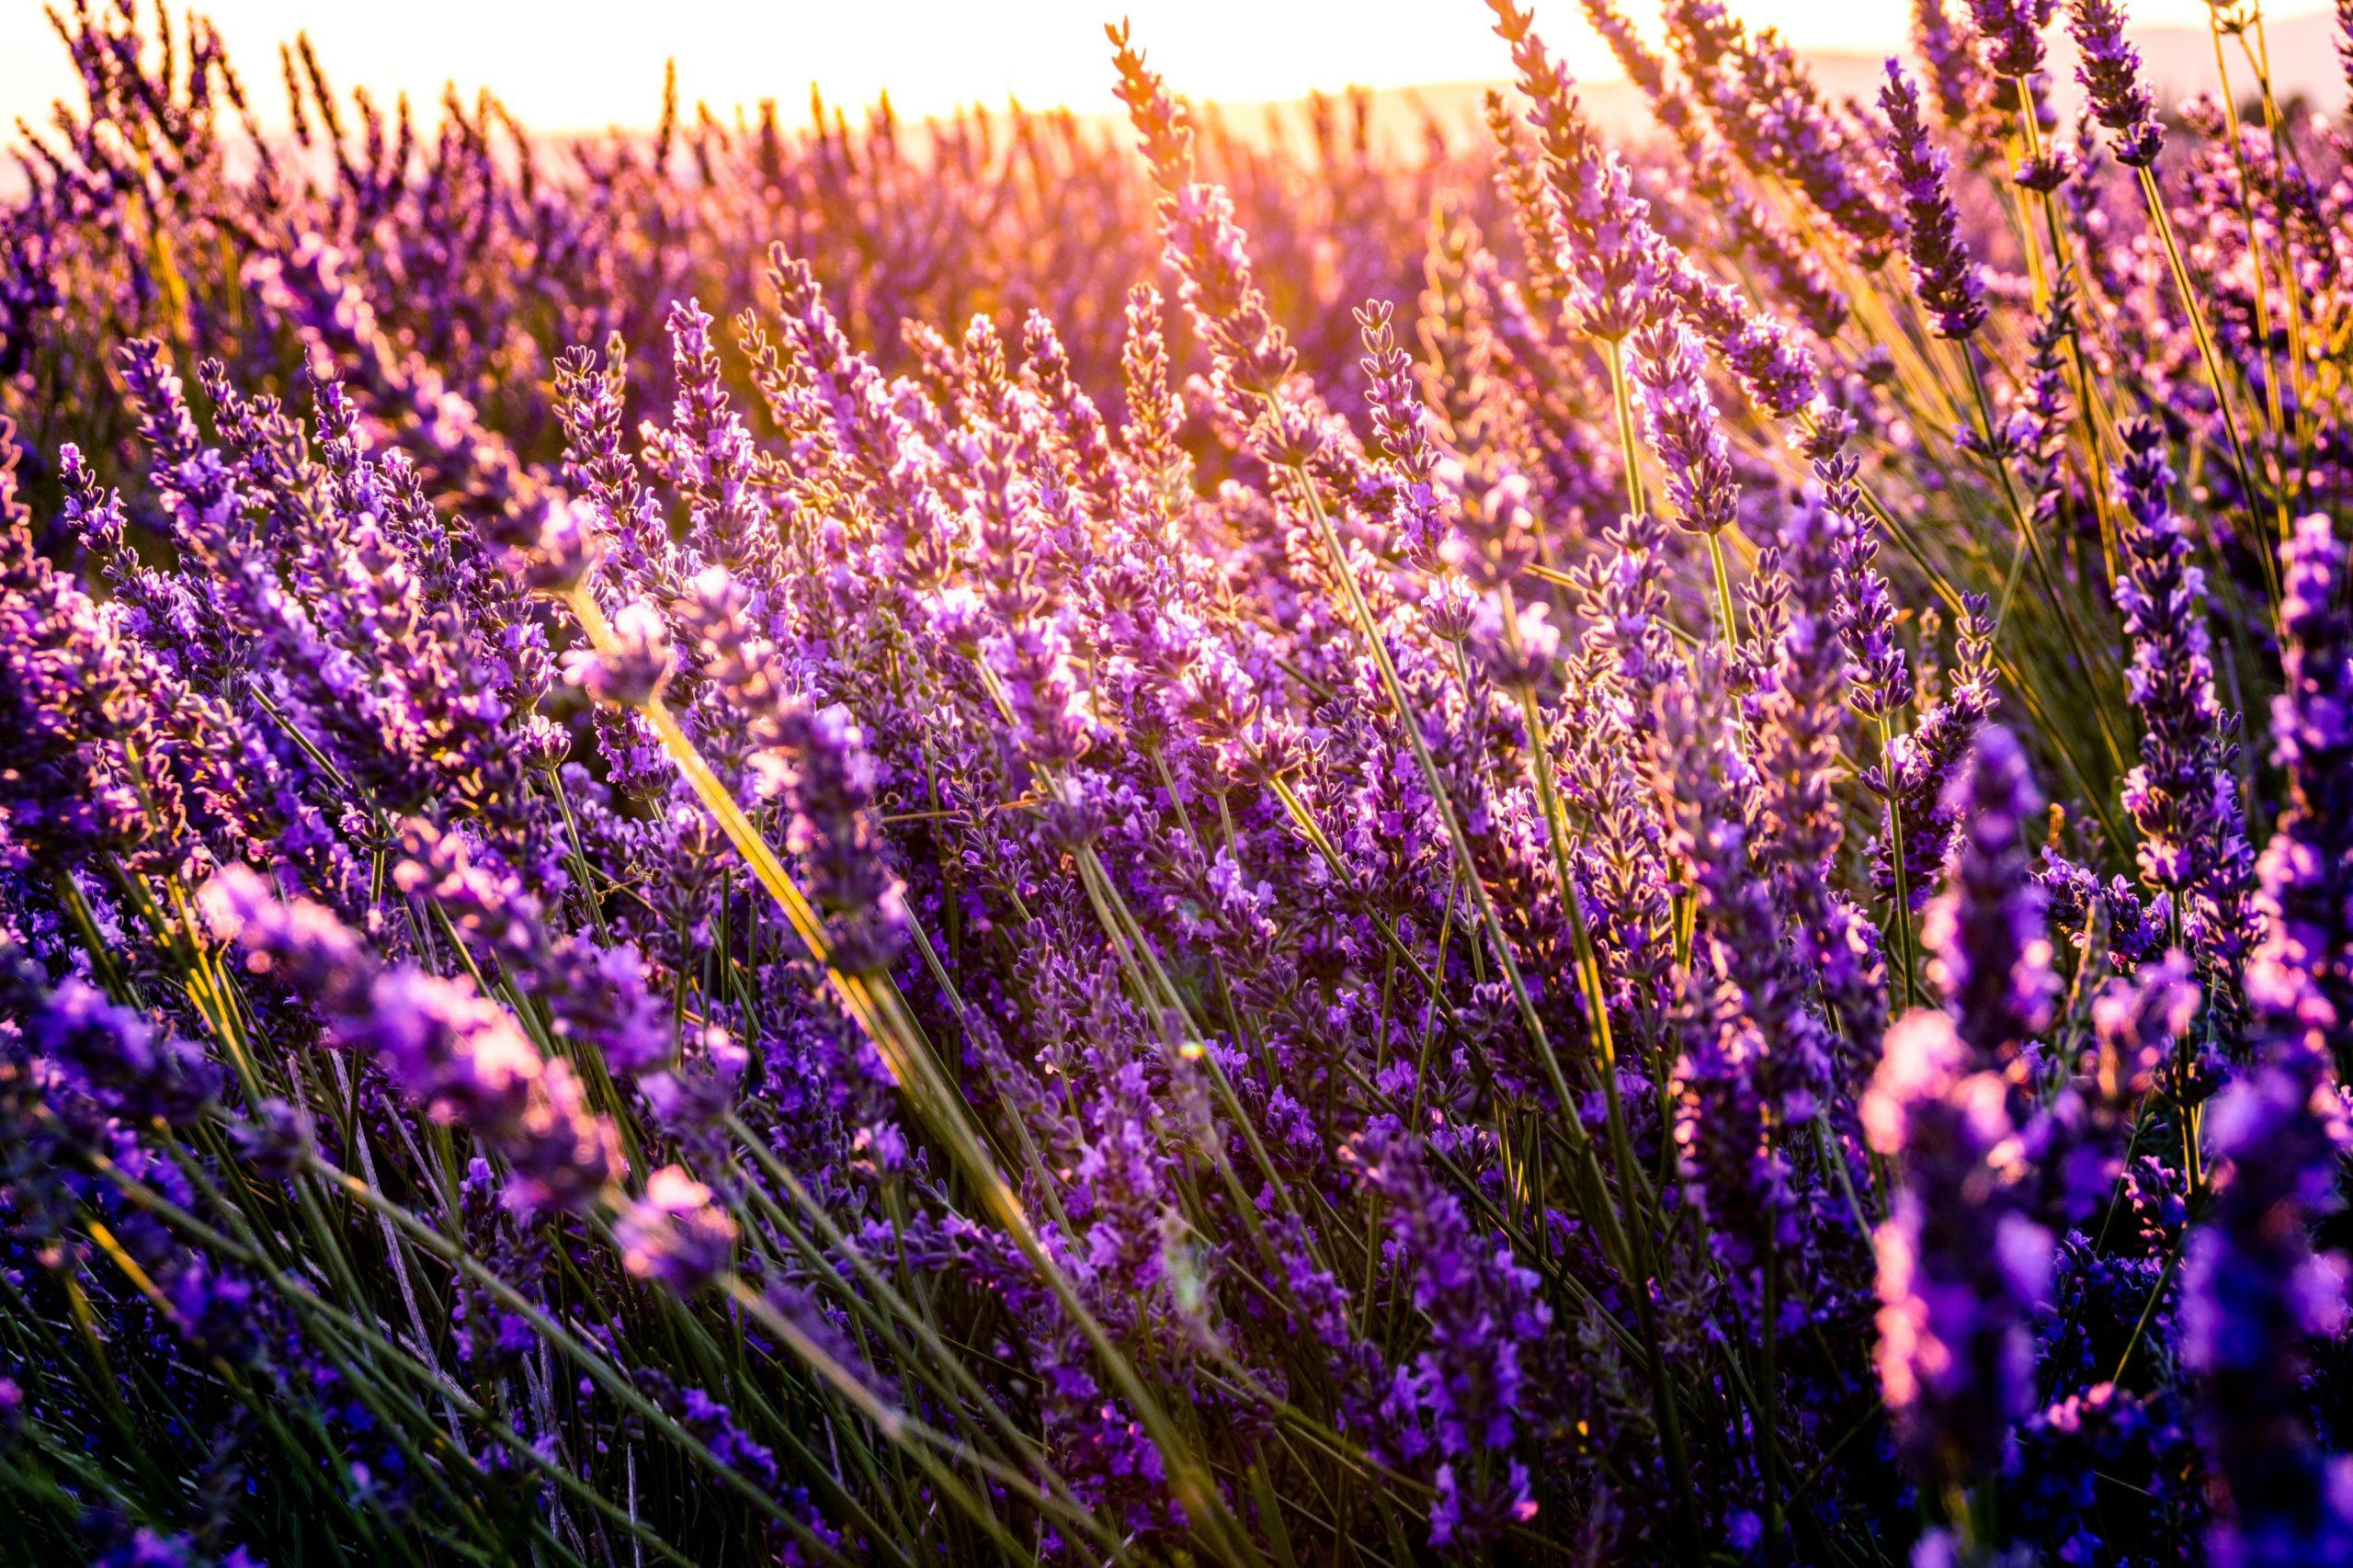 Lavender © Léonard Cotte/unsplash